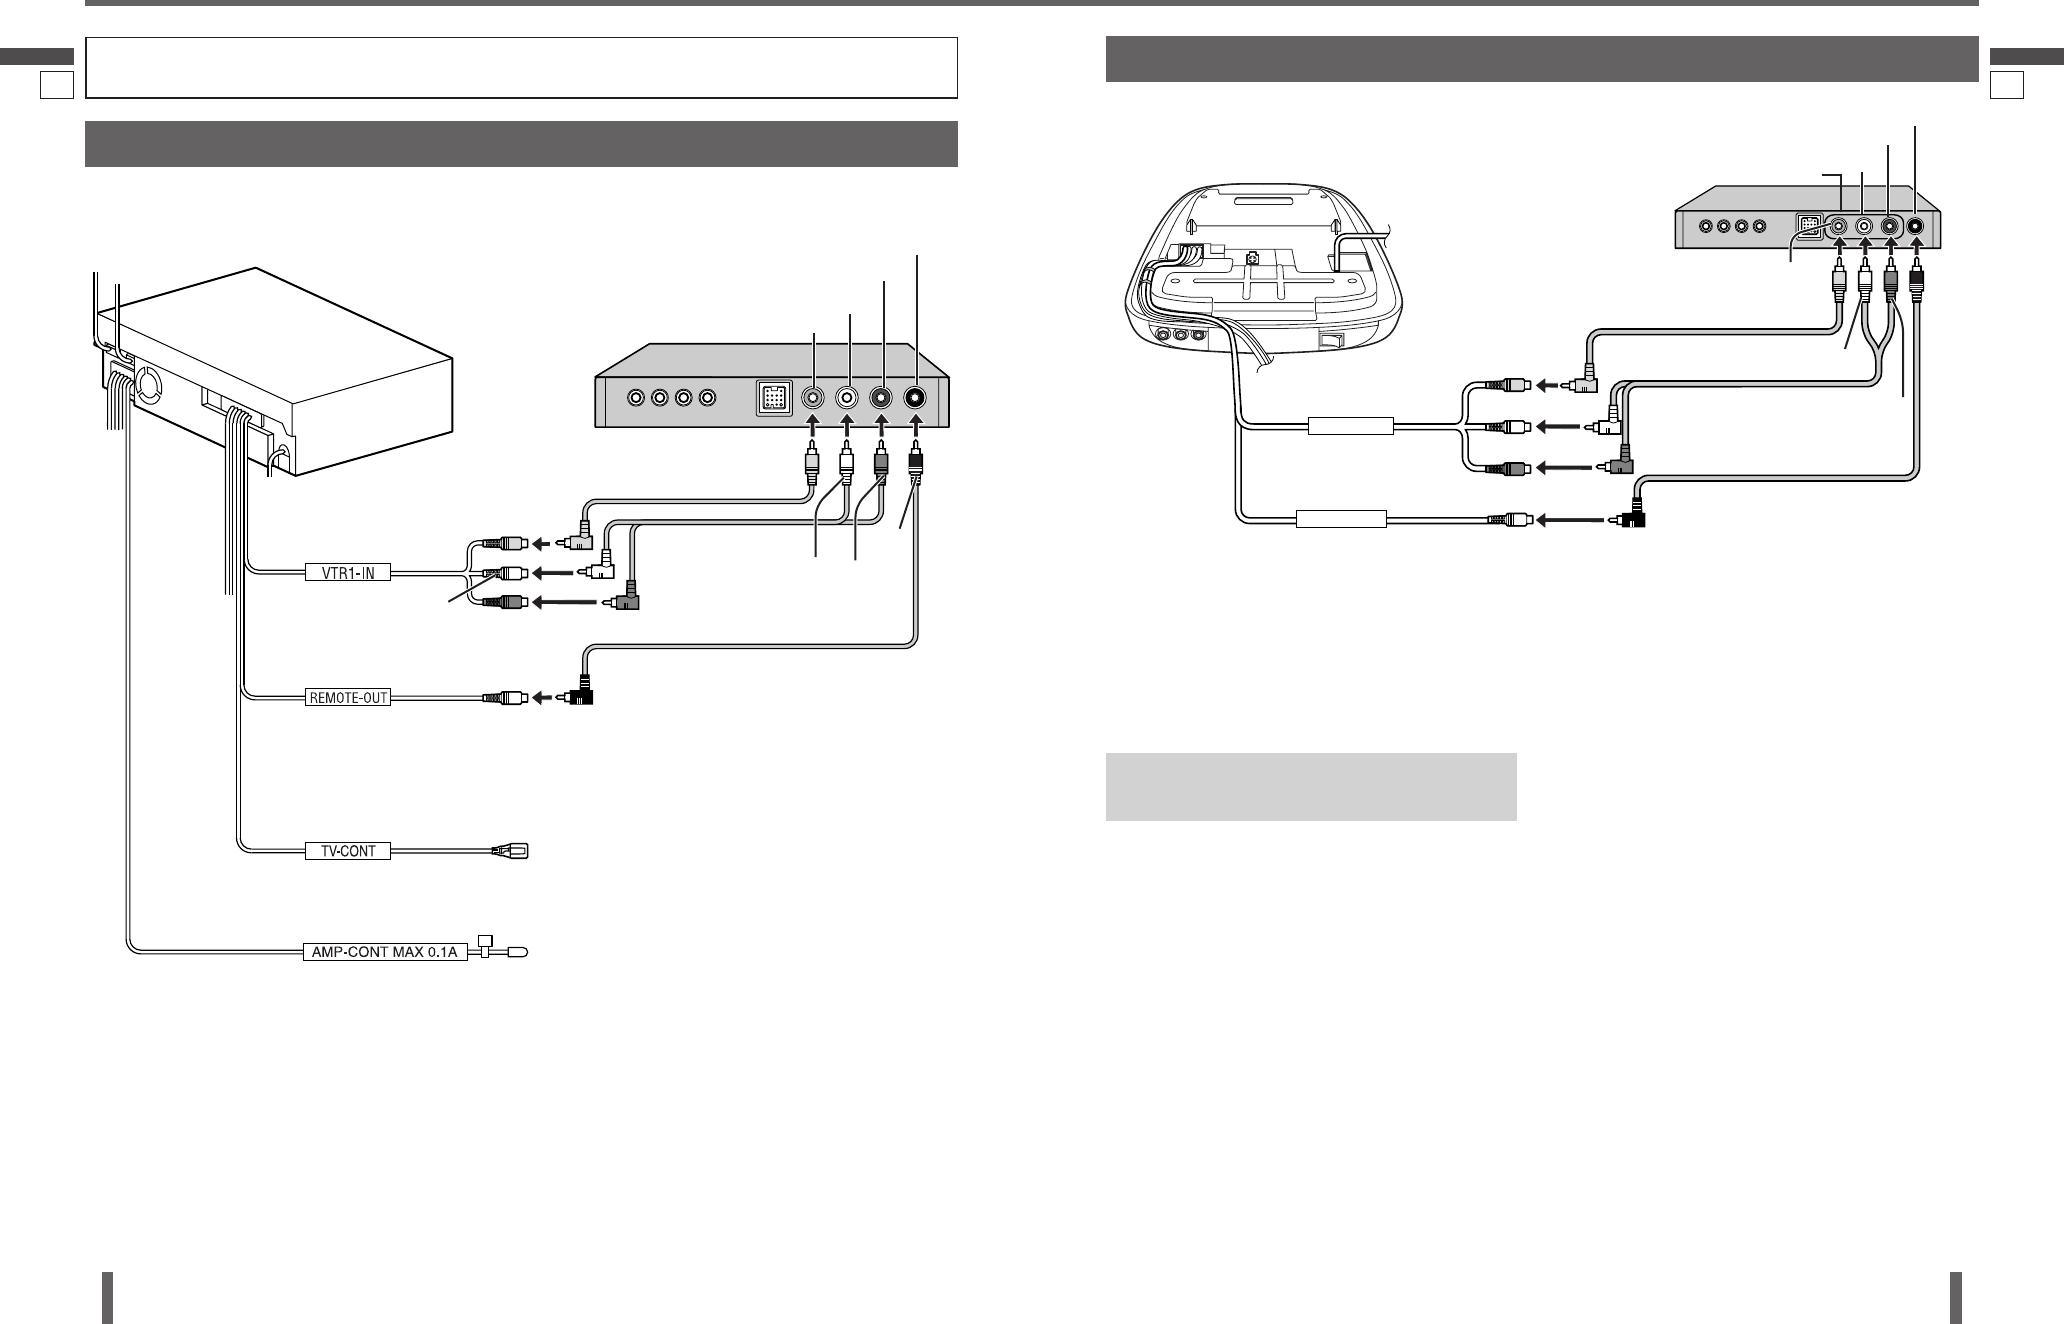 Panasonic Cy Tun153u Connecting With Head Unit Cq Vd7001u